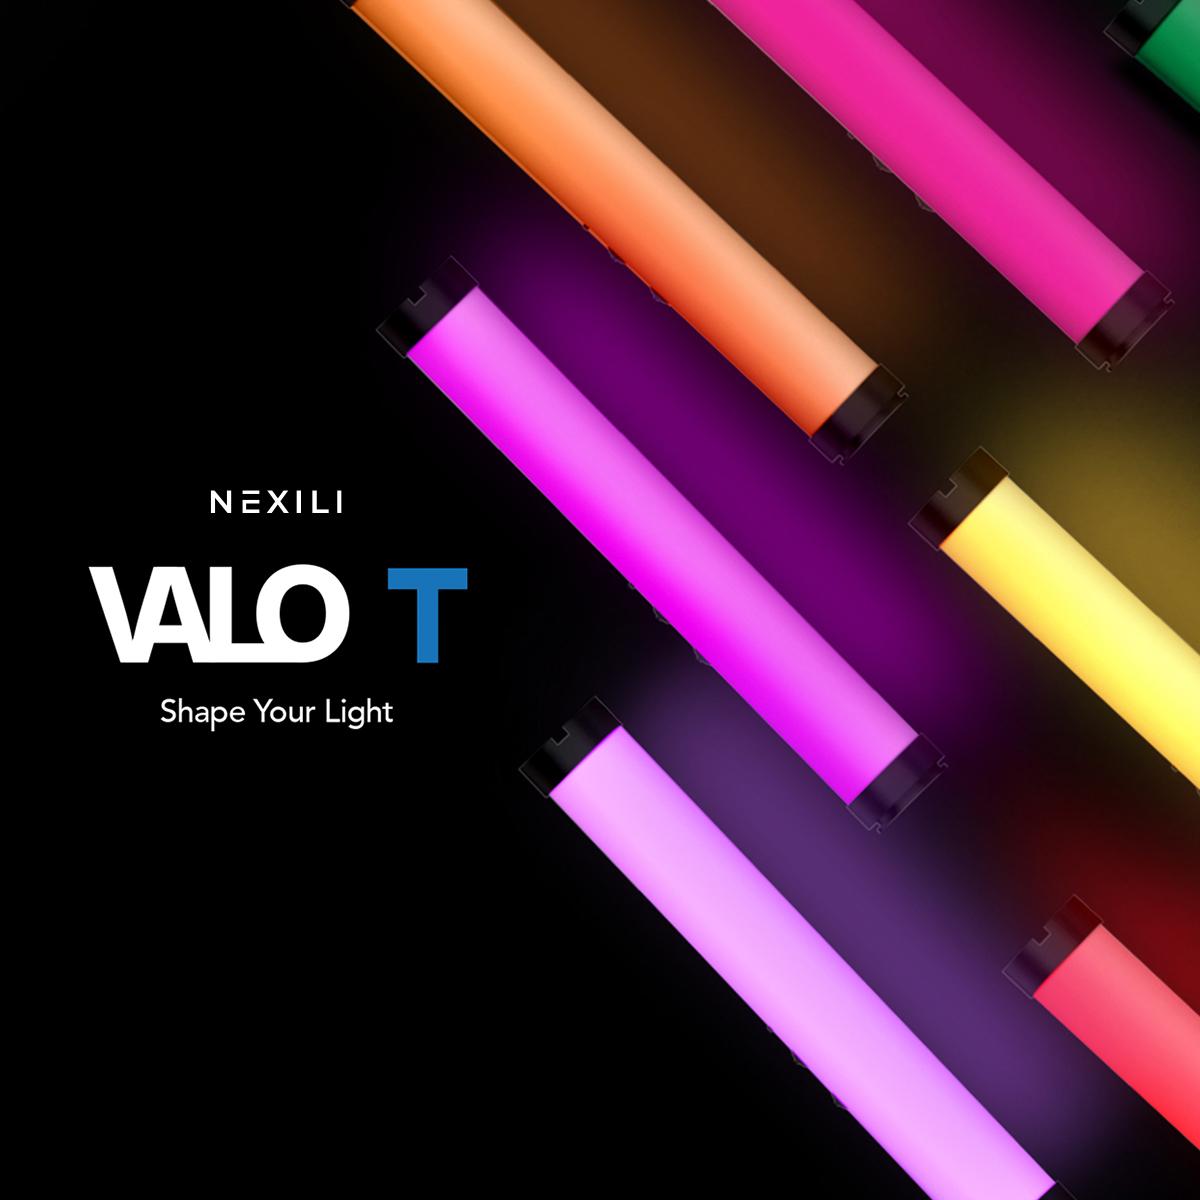 NEXILI VALO T RGB LED TUBE LIGHT 3200K-6200K